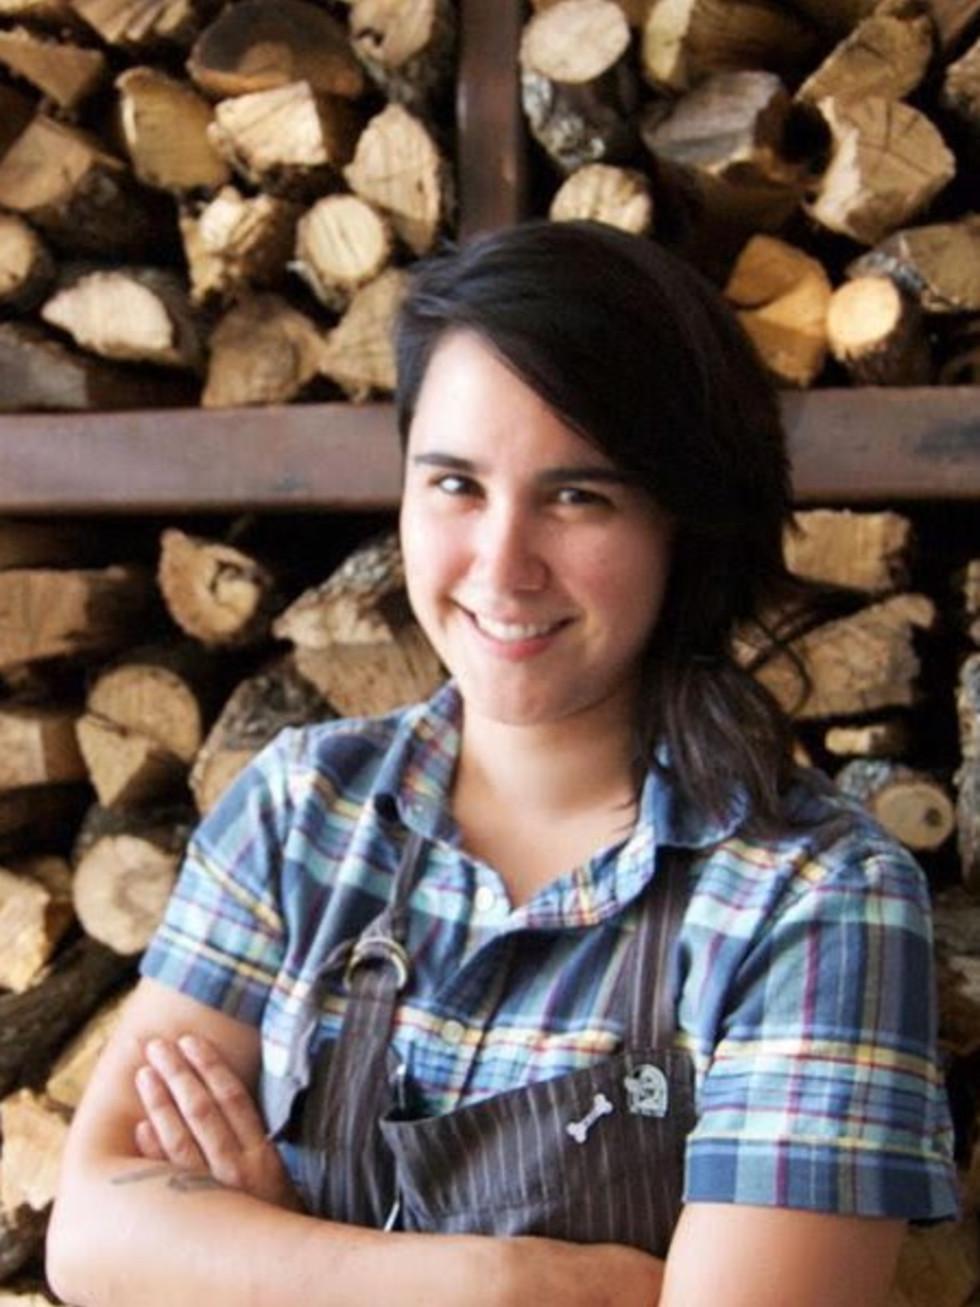 Executive Sous Chef Alexa Mejia of Barley Swine in Austin